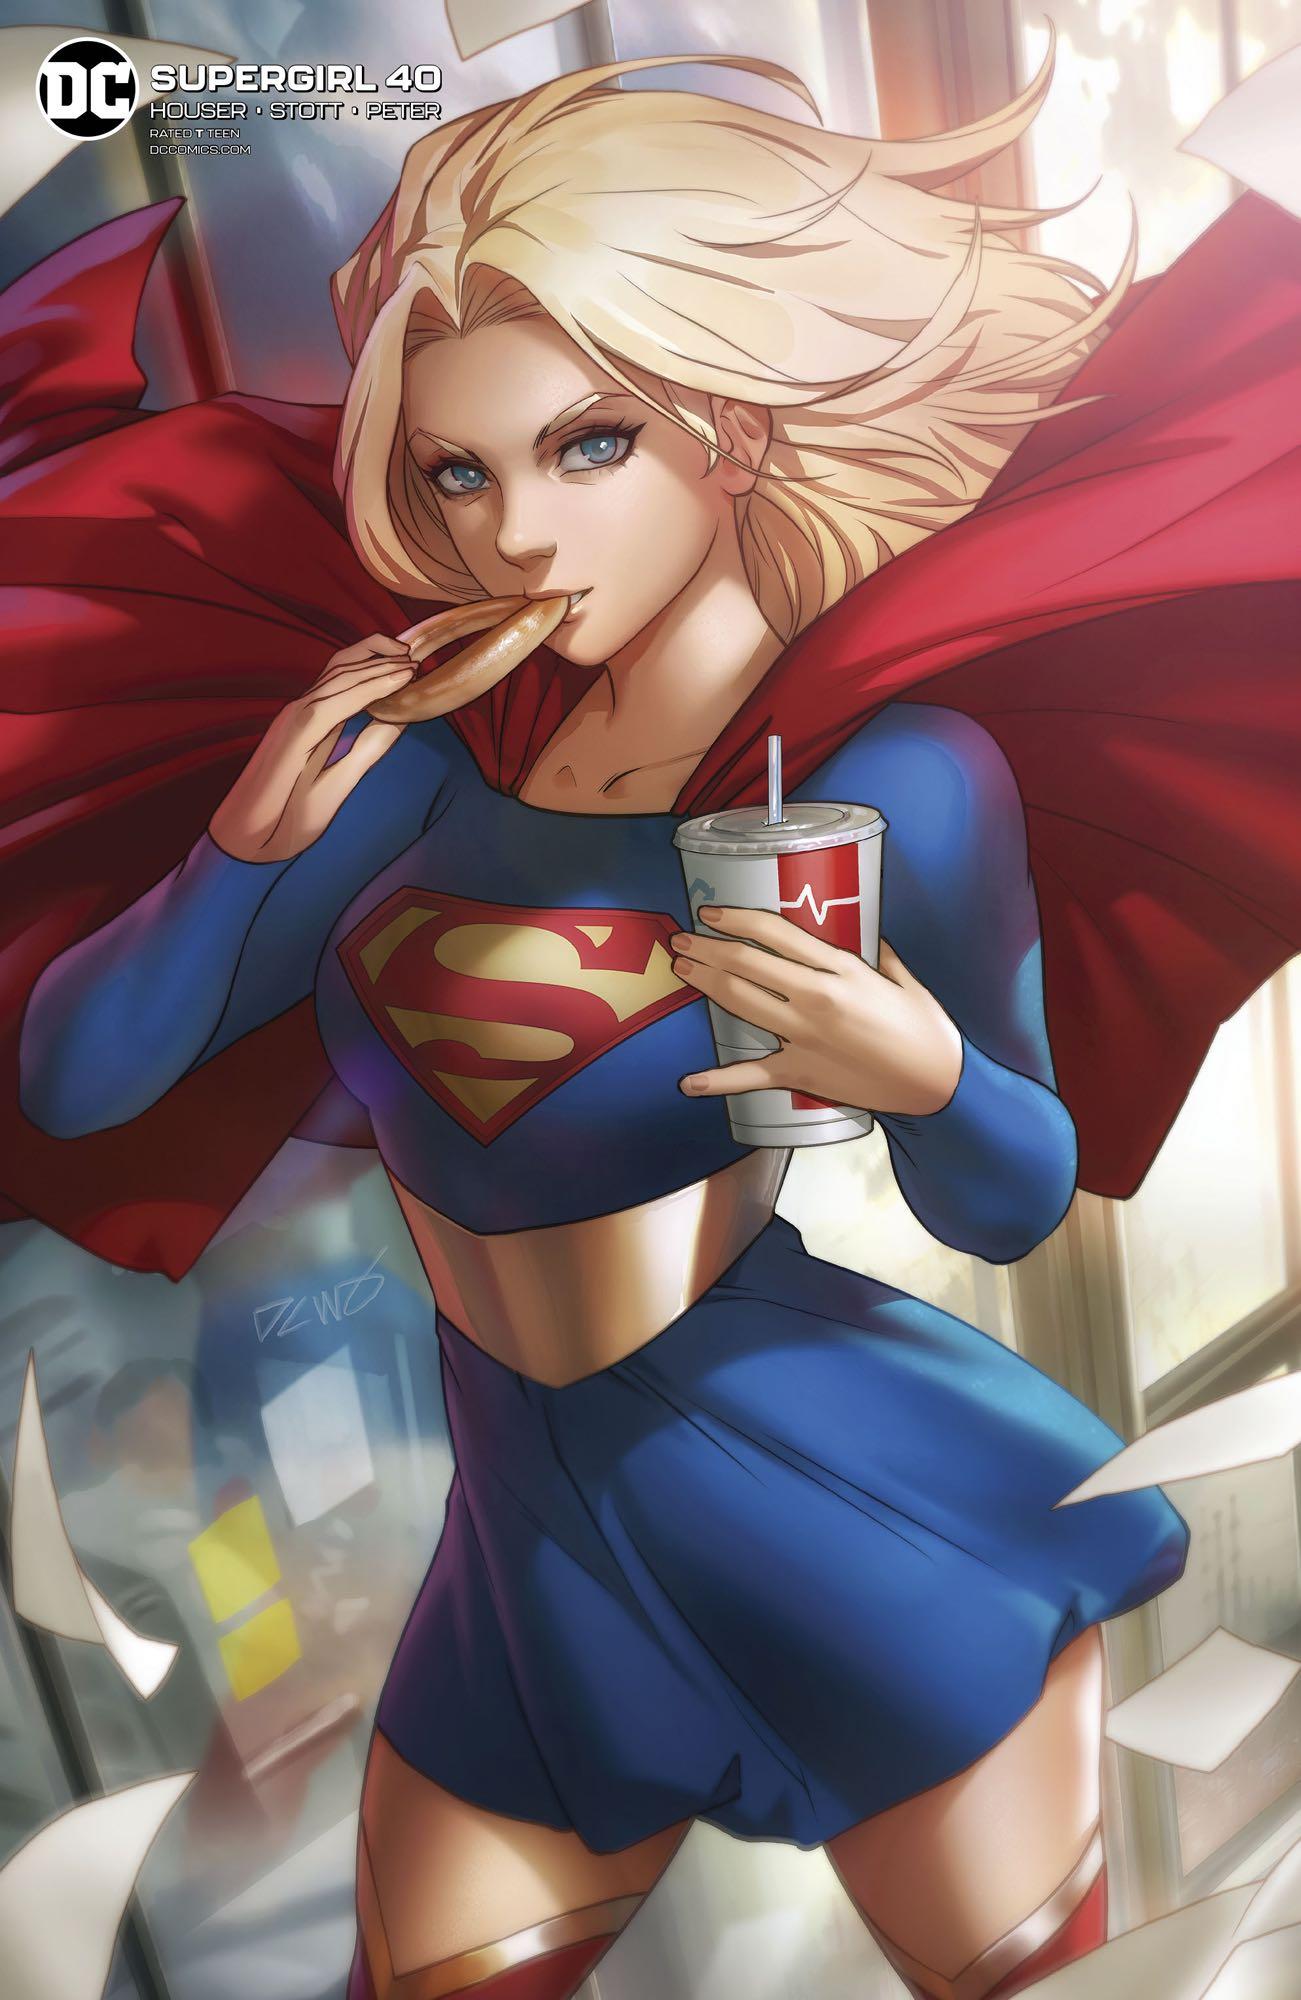 Supergirl Vol 7 40 Variant.jpg